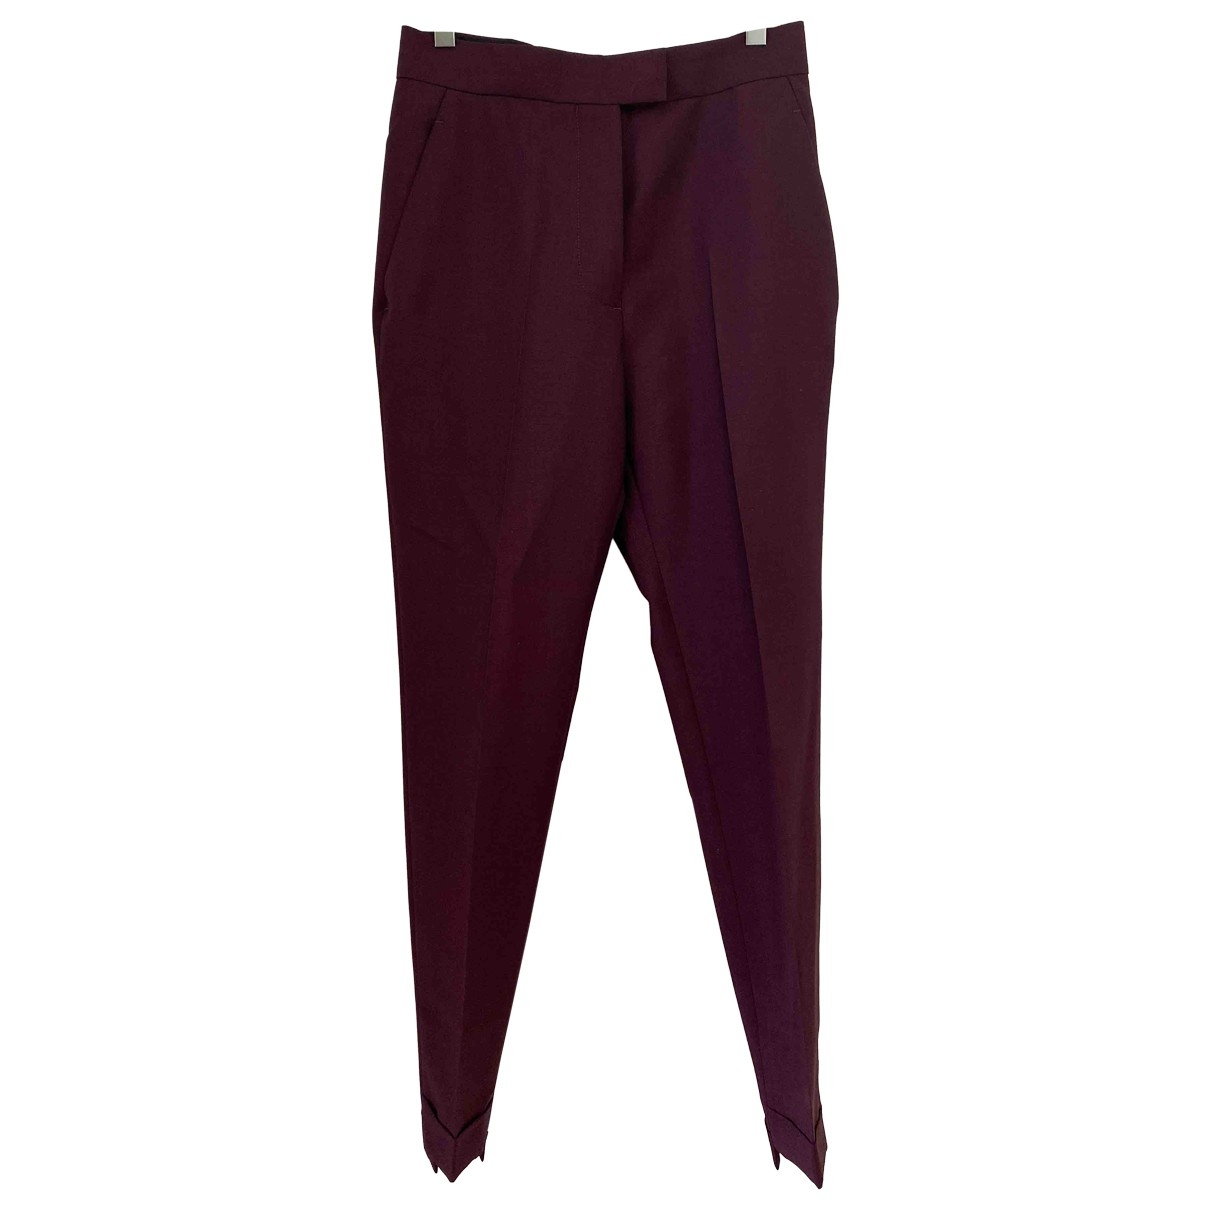 Acne Studios \N Burgundy Wool Trousers for Women 34 FR